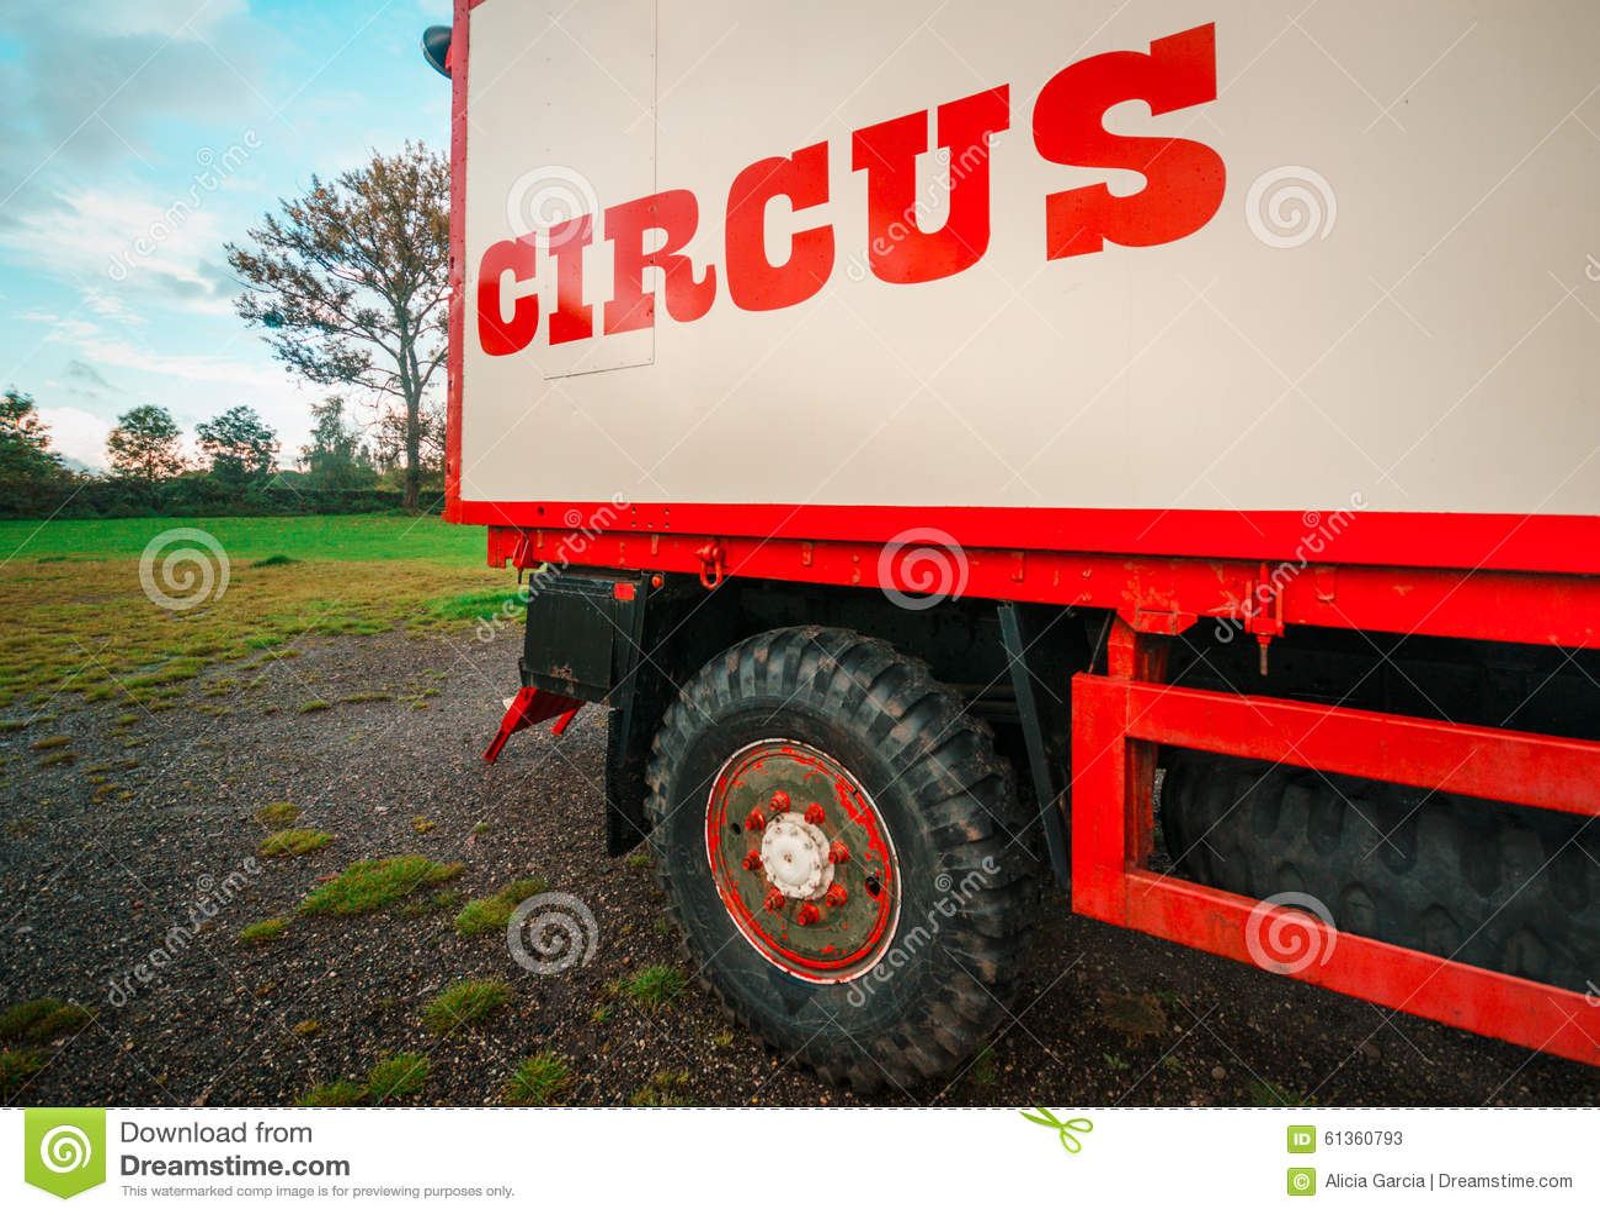 Circus - Nomadic artists